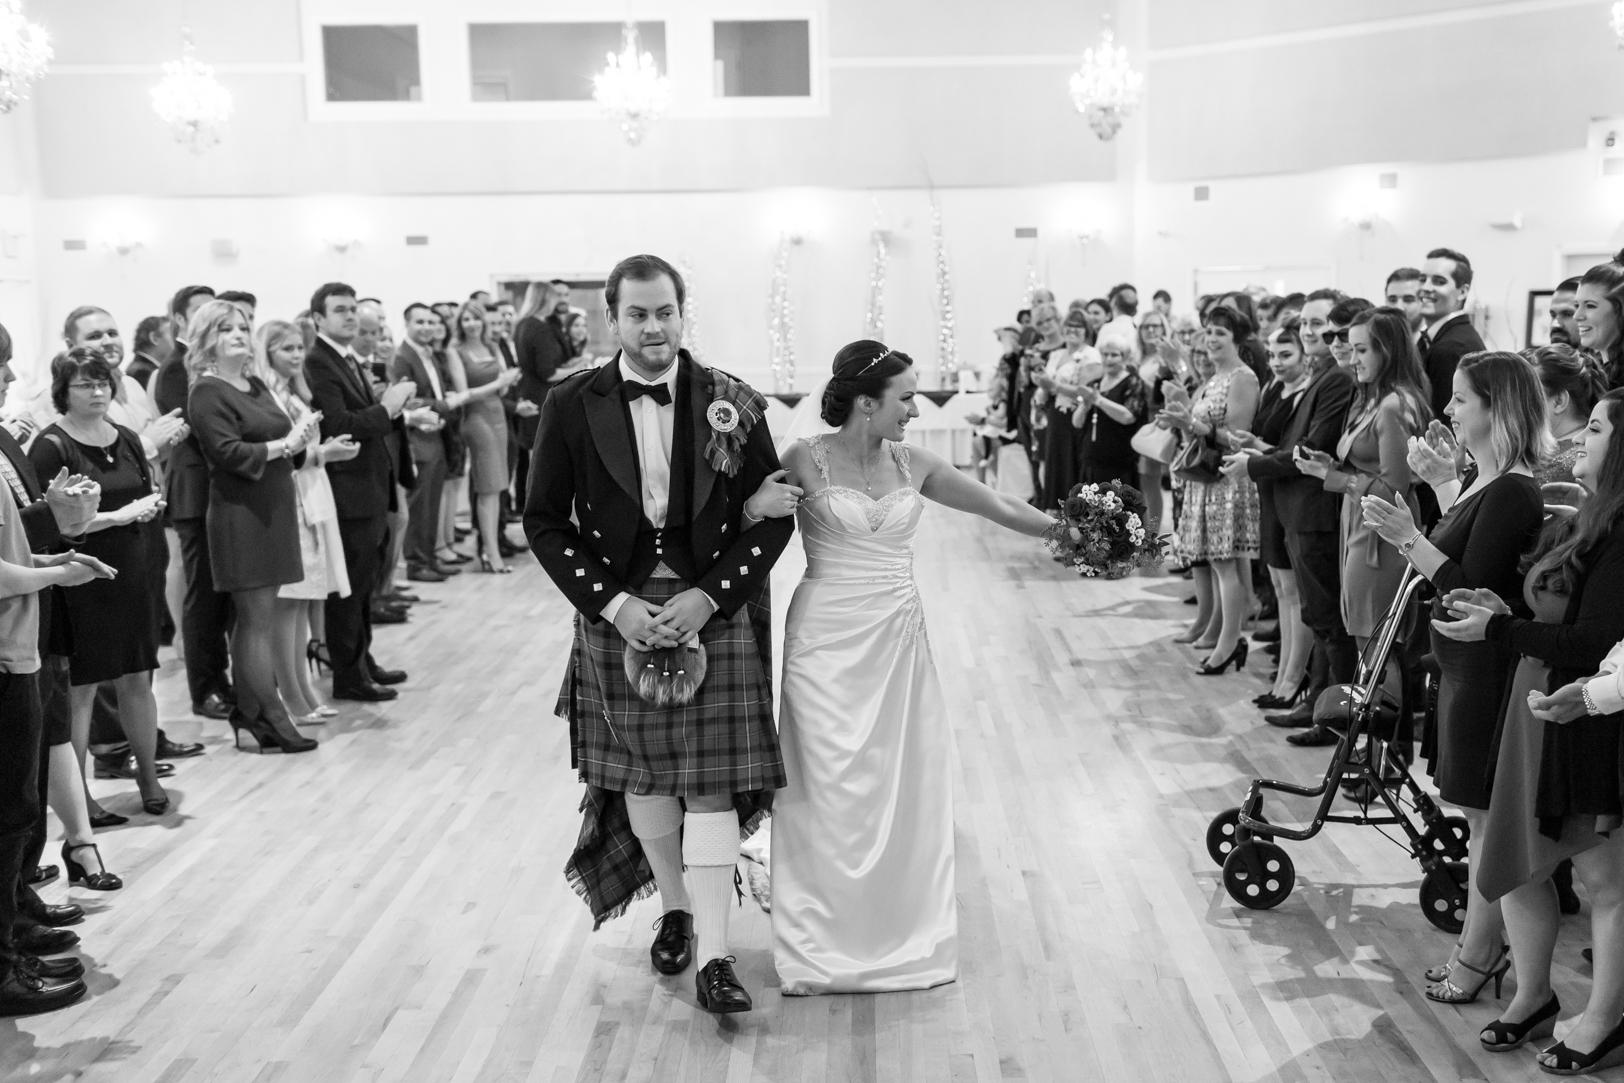 scottish bagpipes at wedding